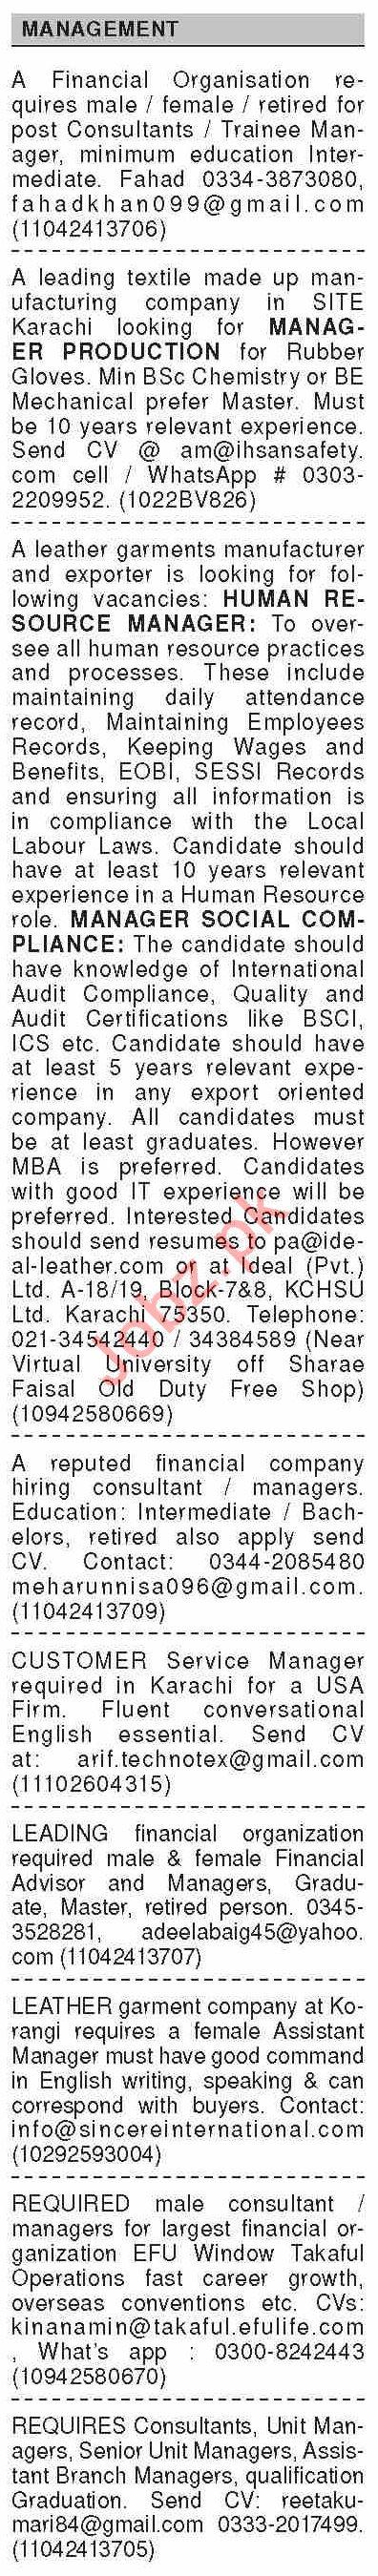 Dawn Sunday Classified Ads 5th July 2020 Management Staff